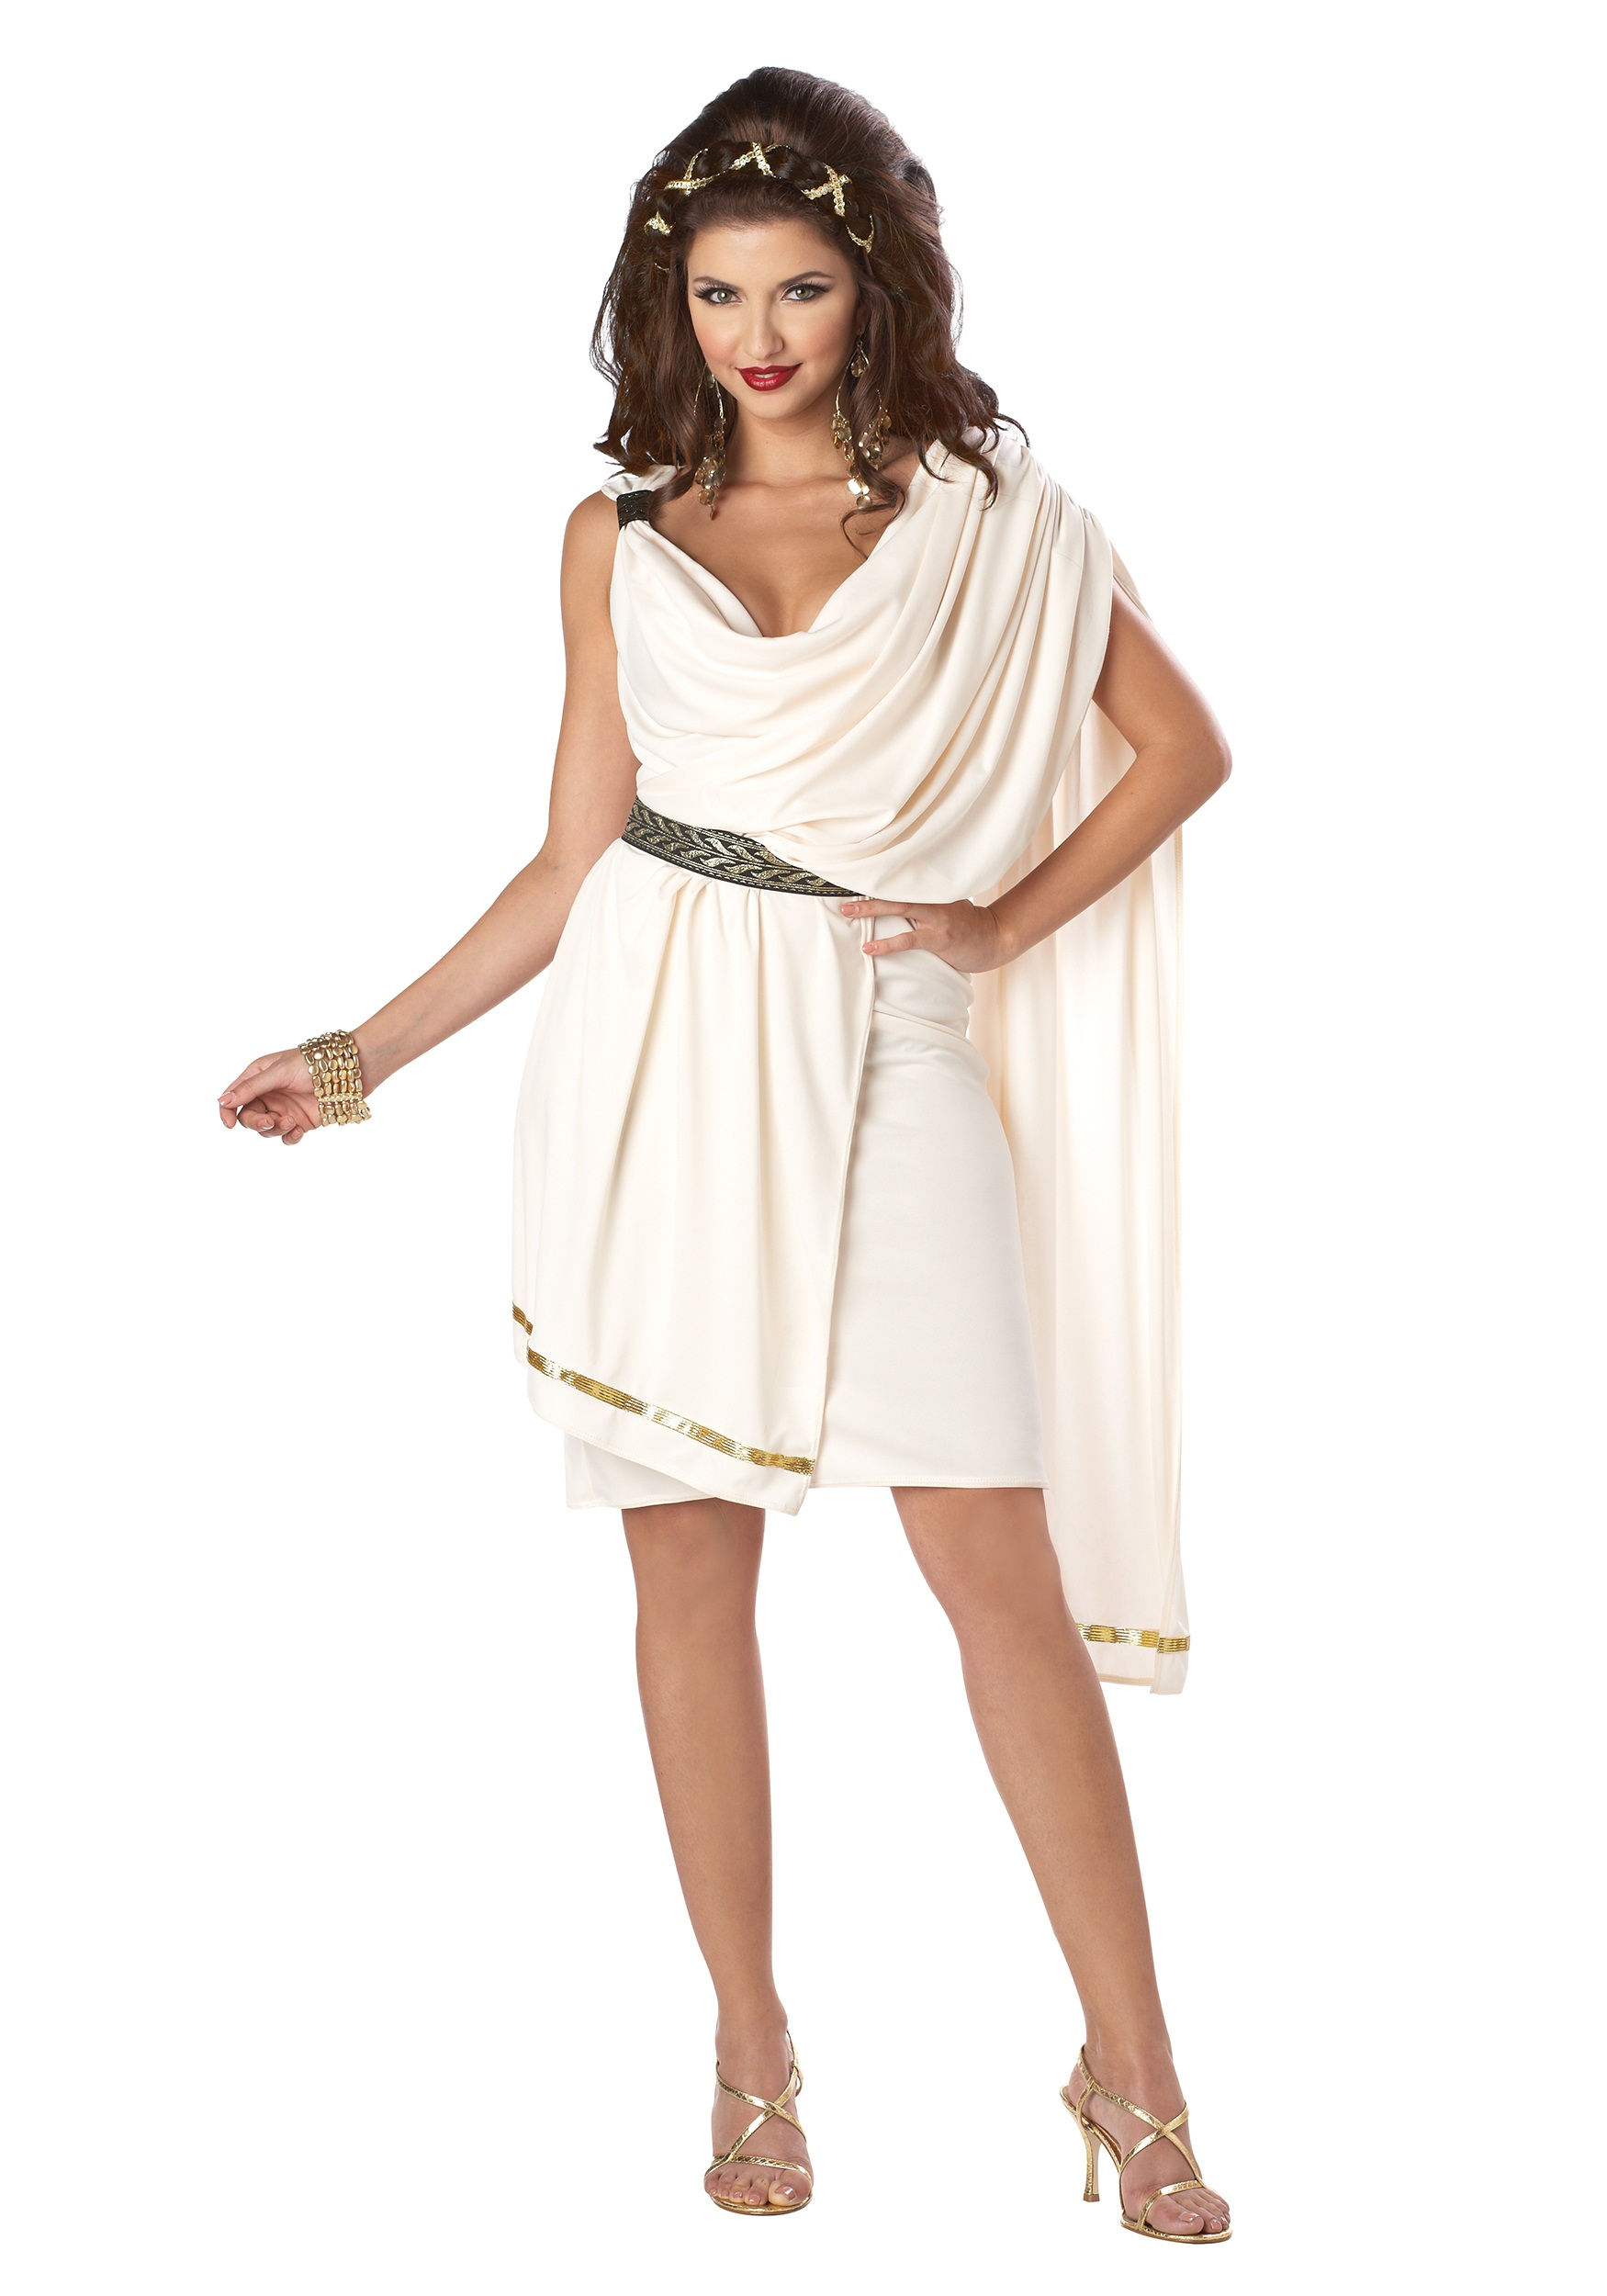 Deluxe Classic Women's Toga Costume | Greek Goddess Costume